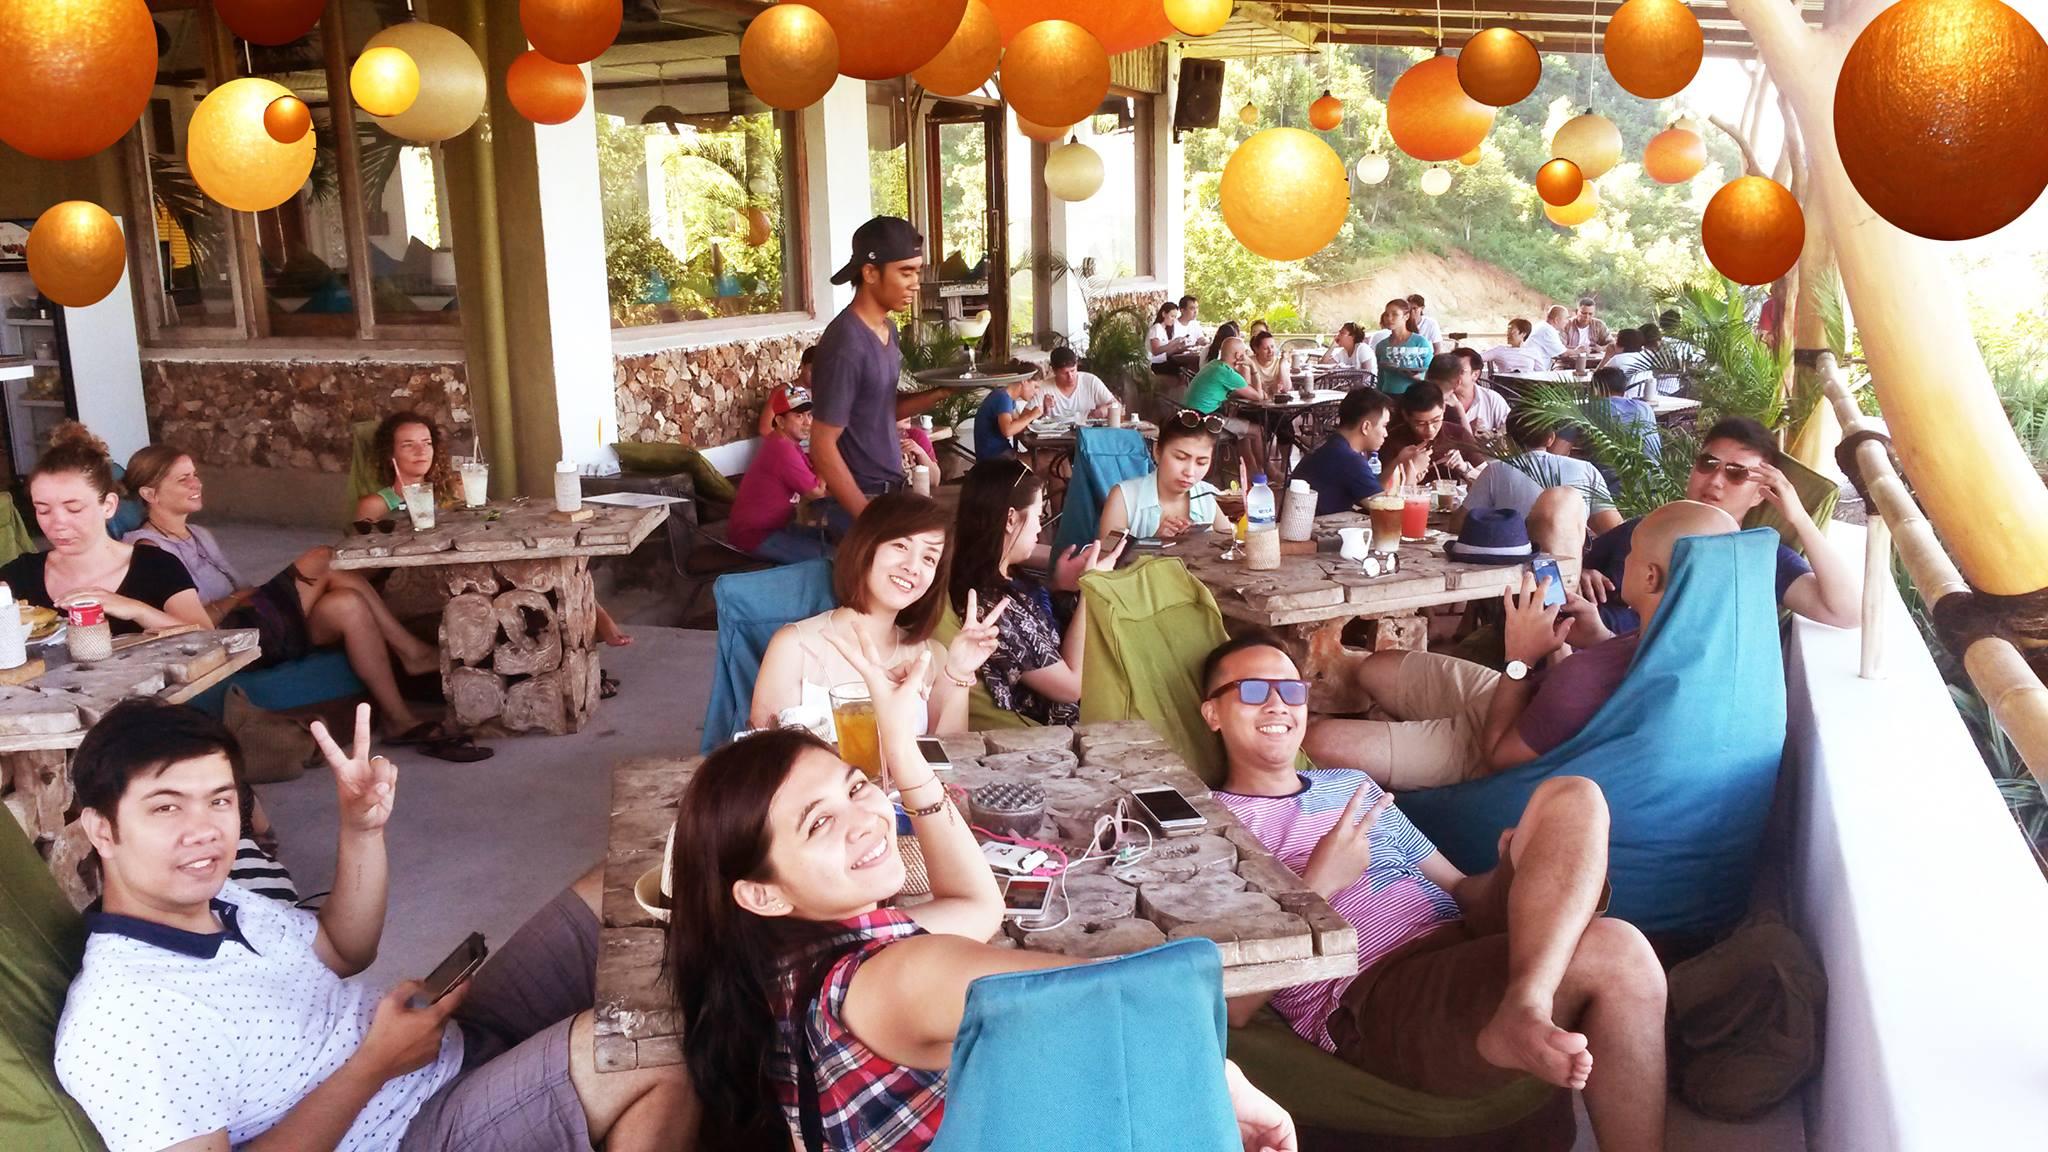 ashtari-restaurant-and-yoga-shala-indonesia-12